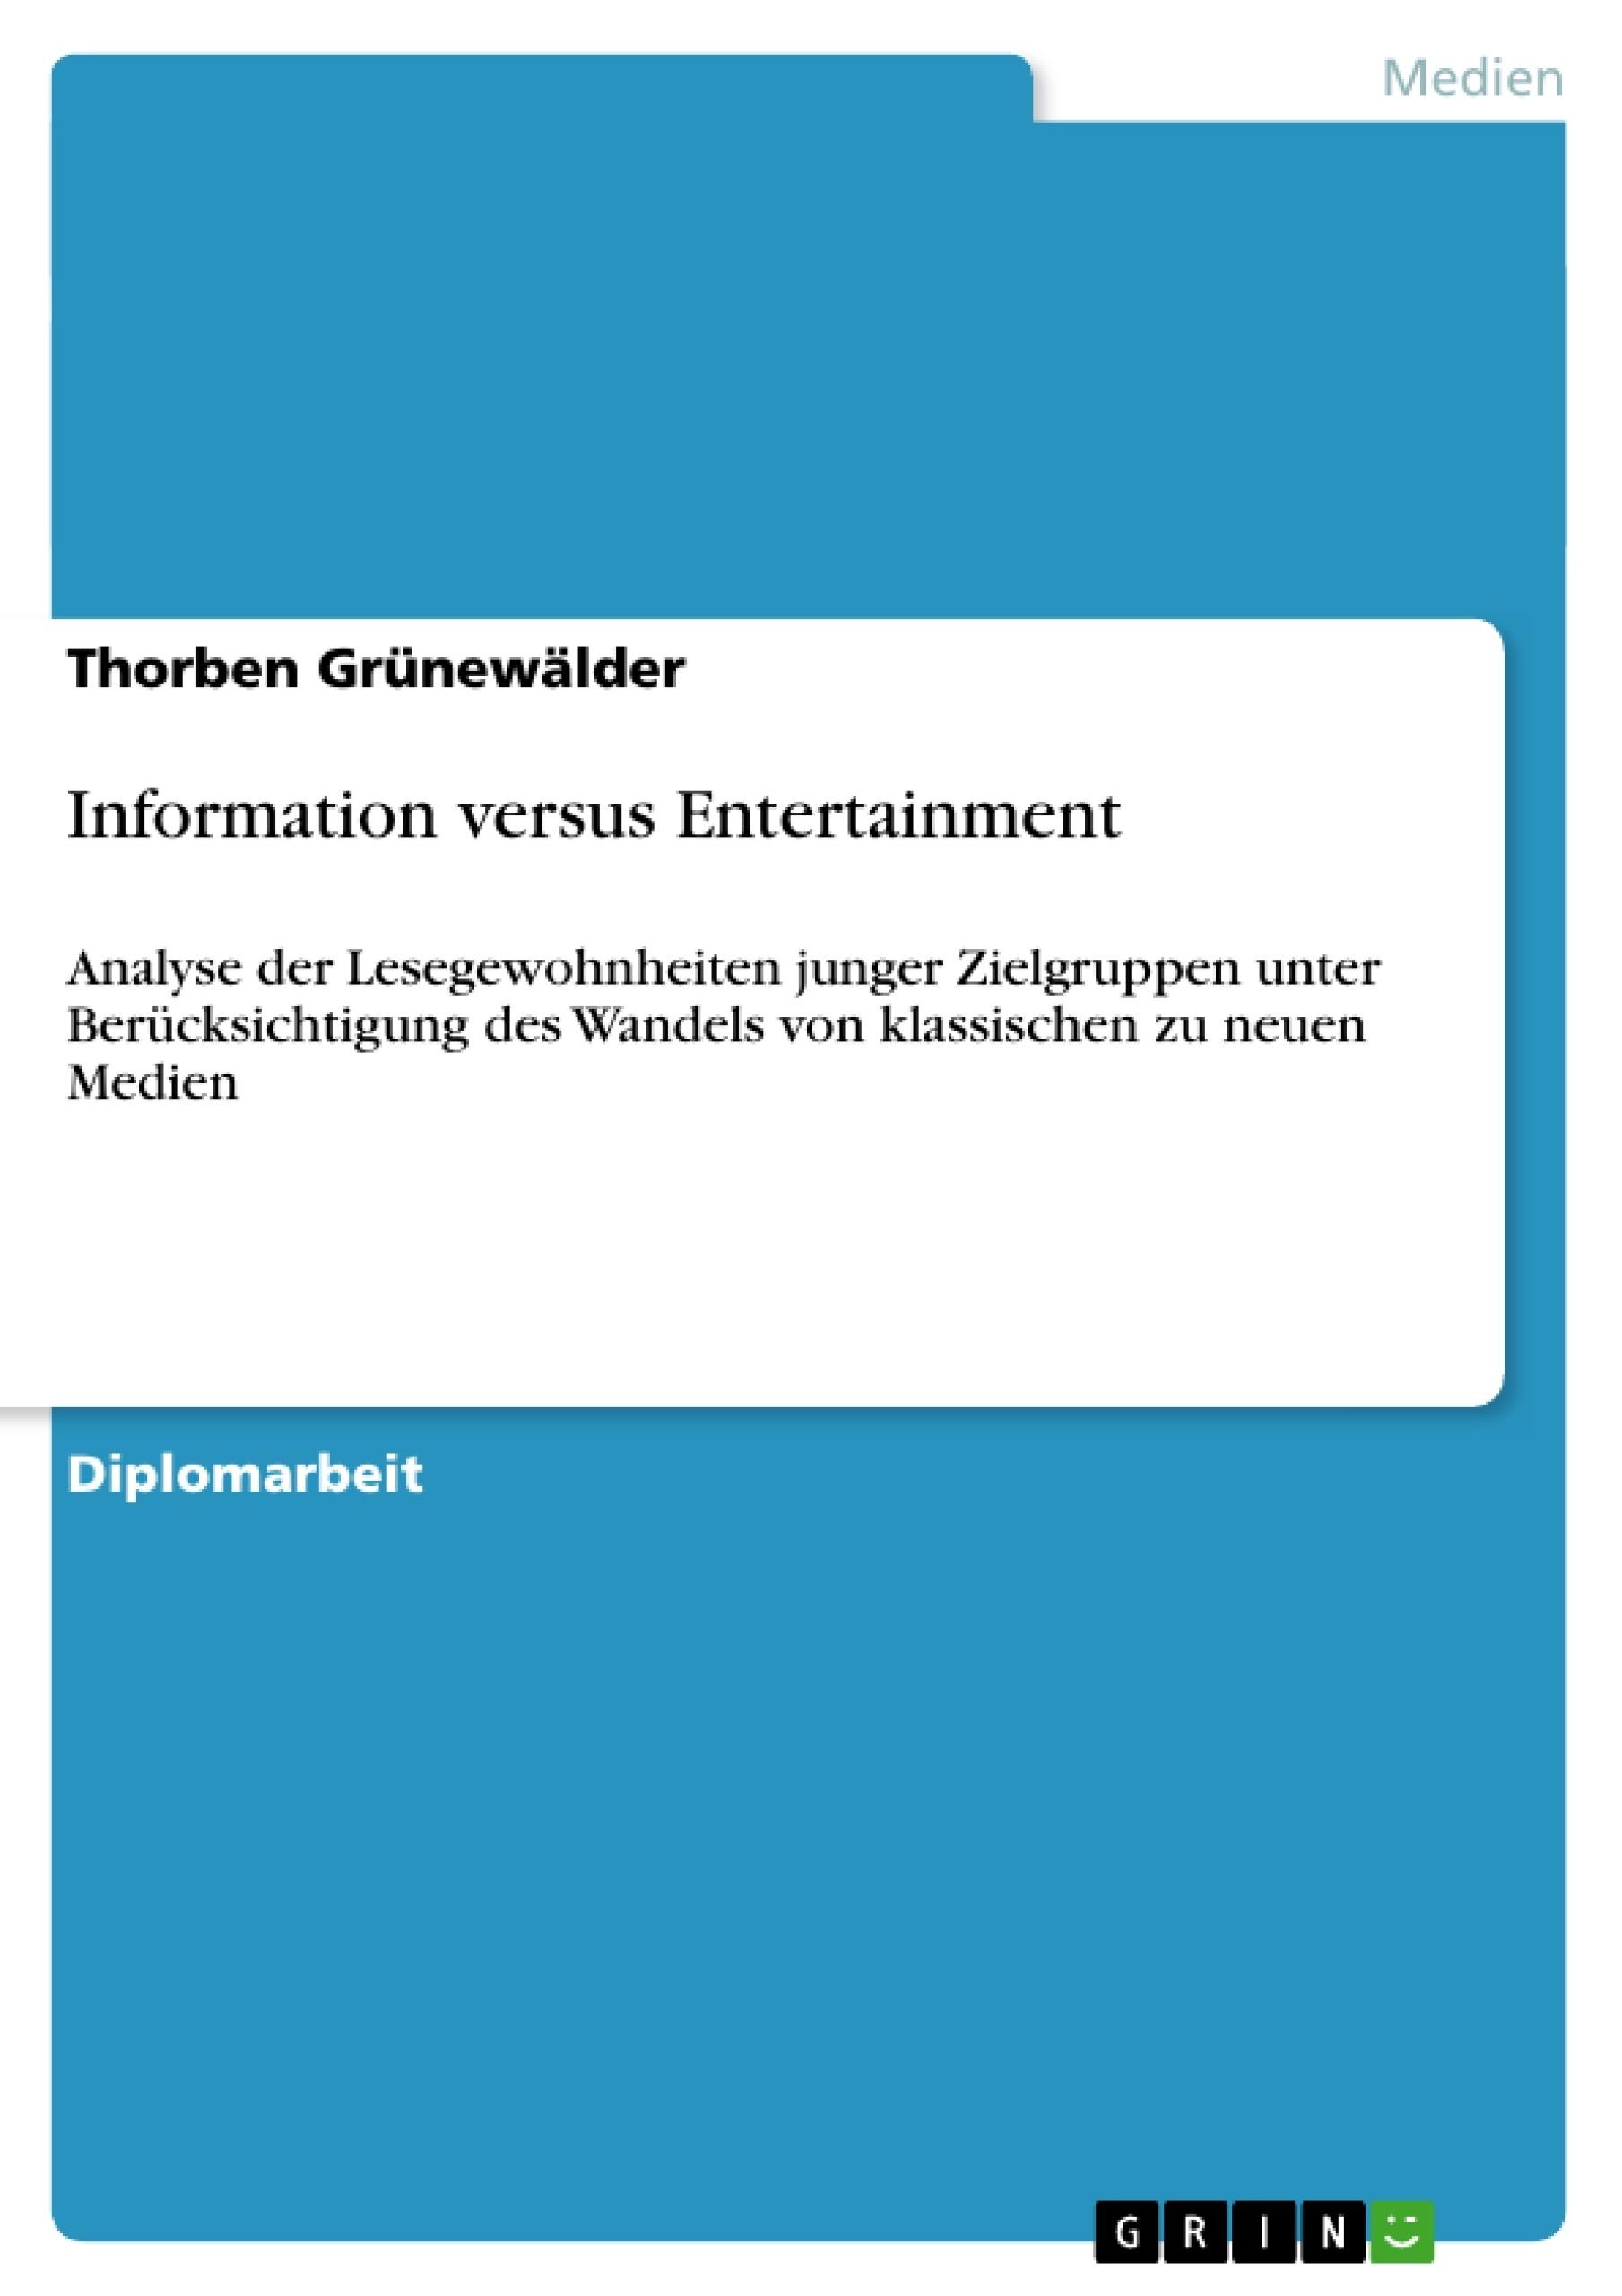 Titel: Information versus Entertainment